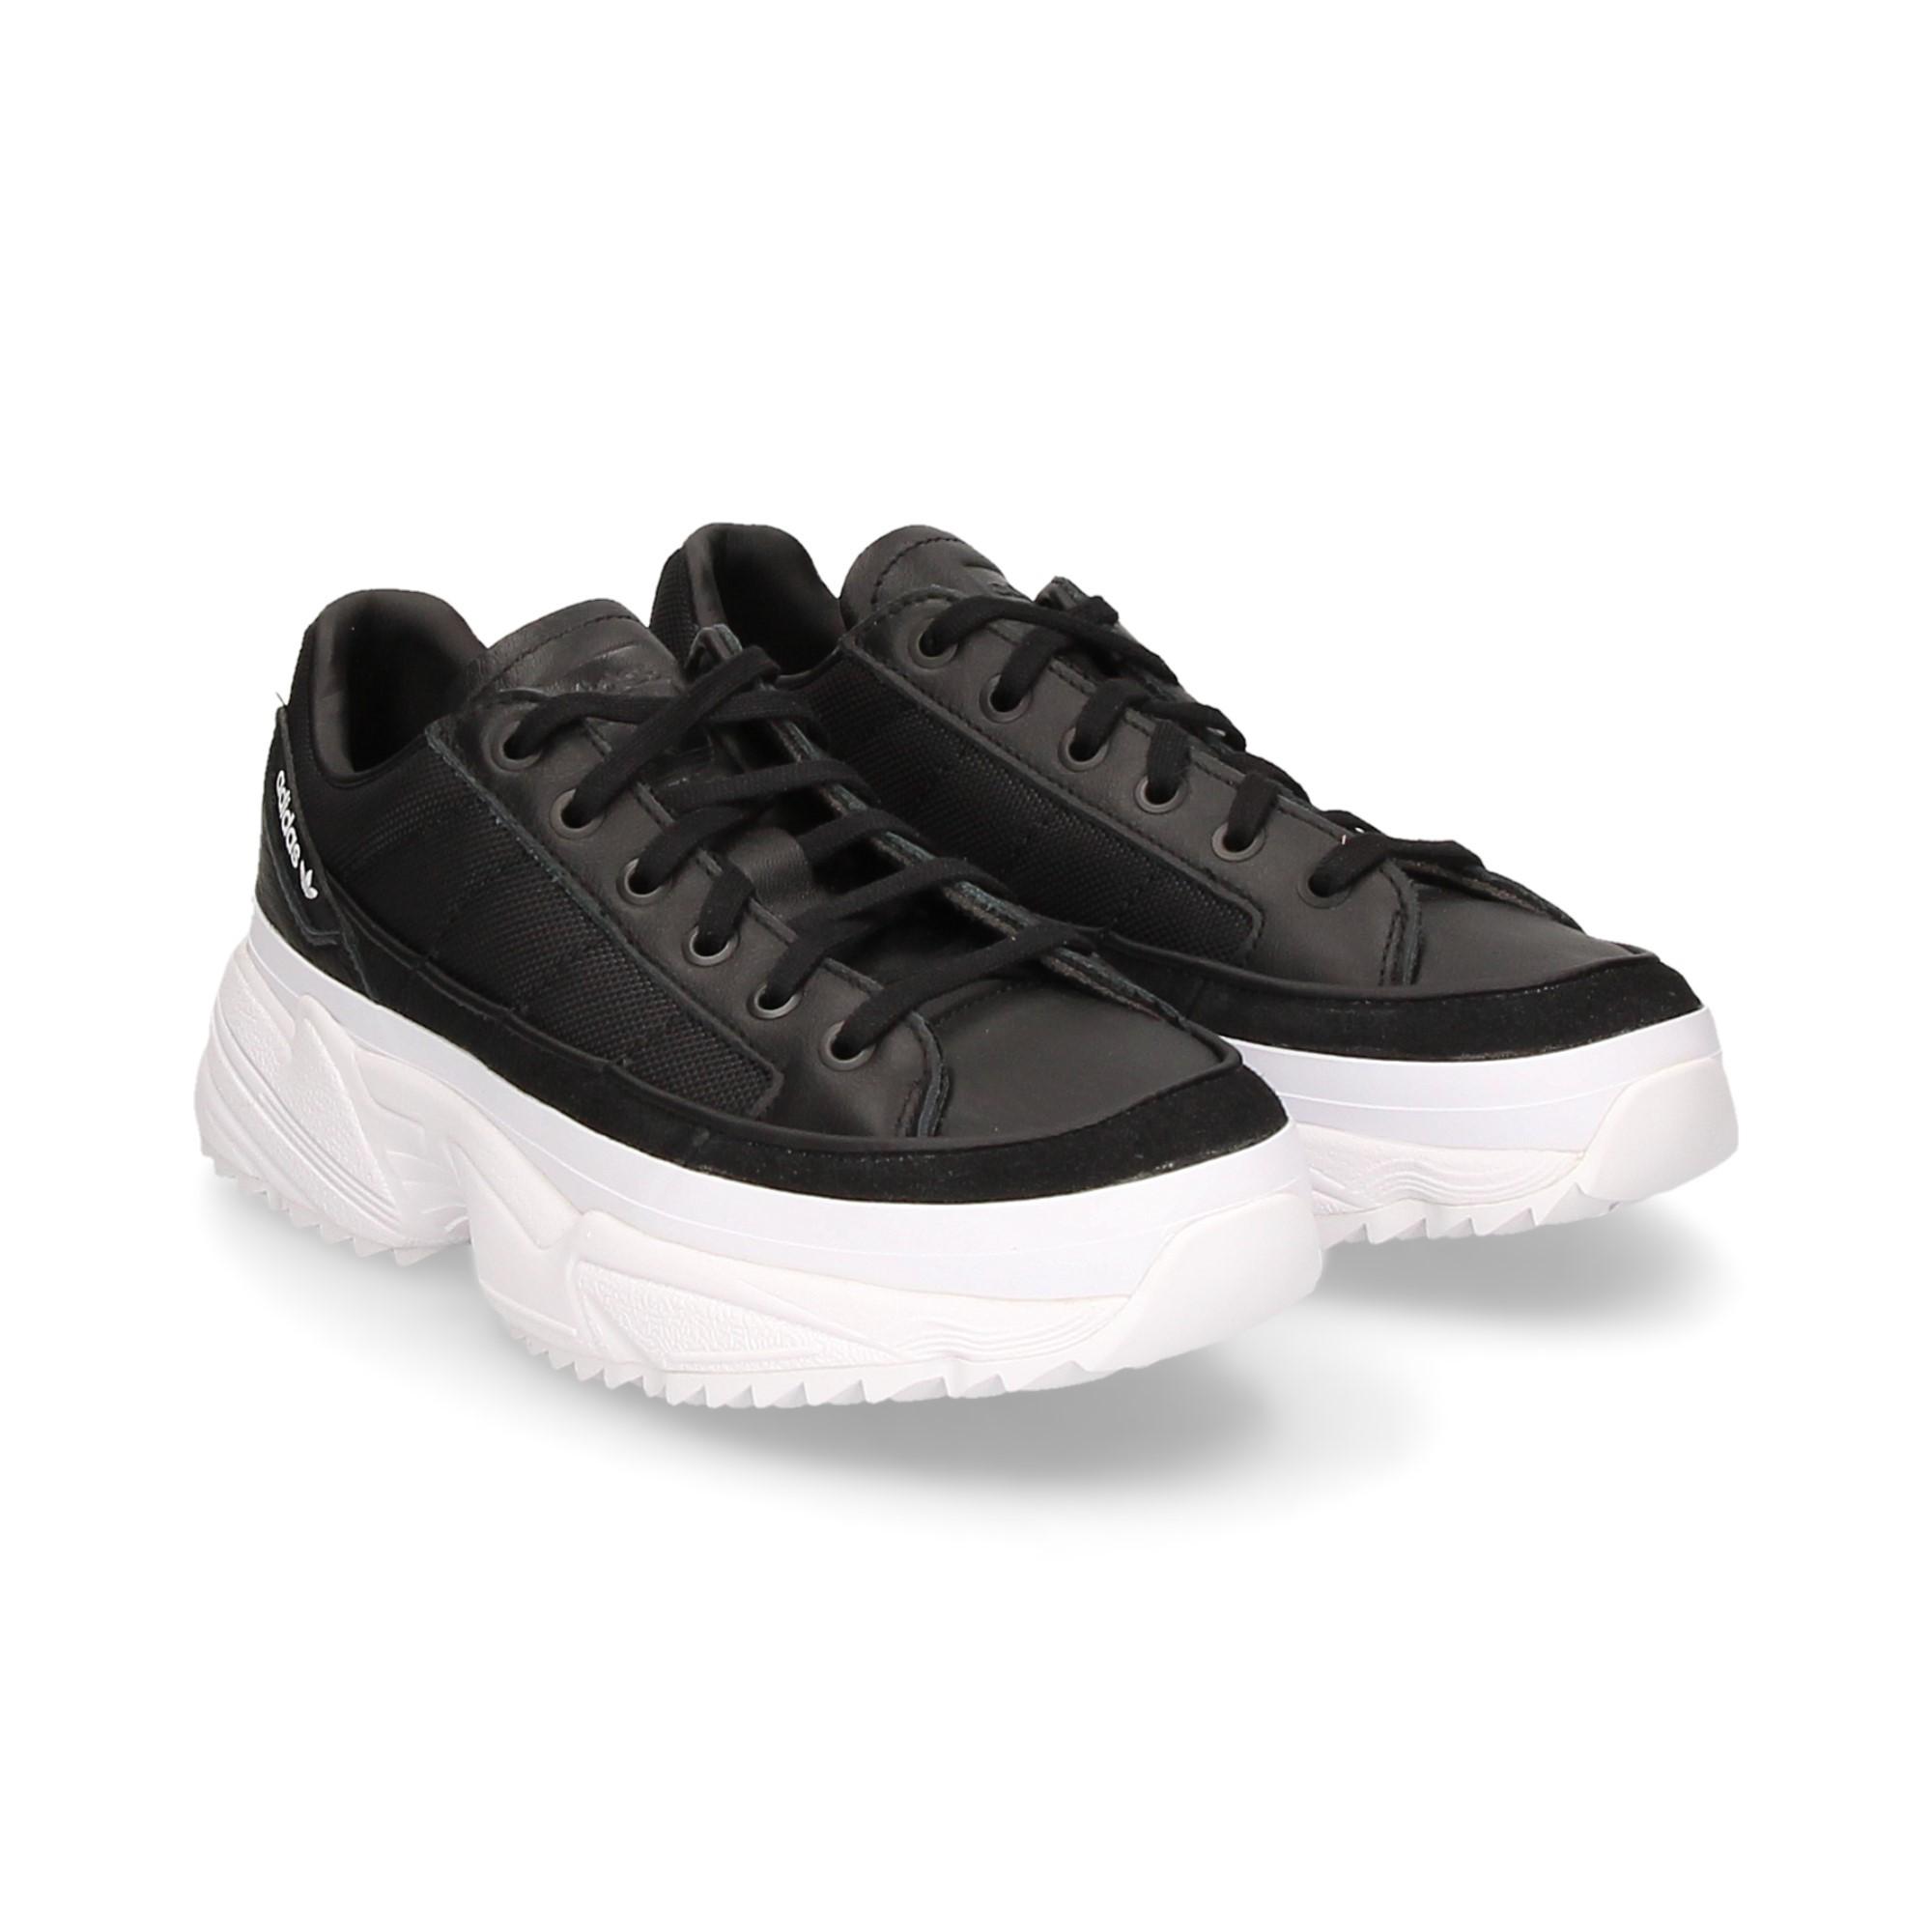 Boutique en ligne 7f893 c92bc ADIDAS Women's Sneakers KIELLOR NEGRO BASICO